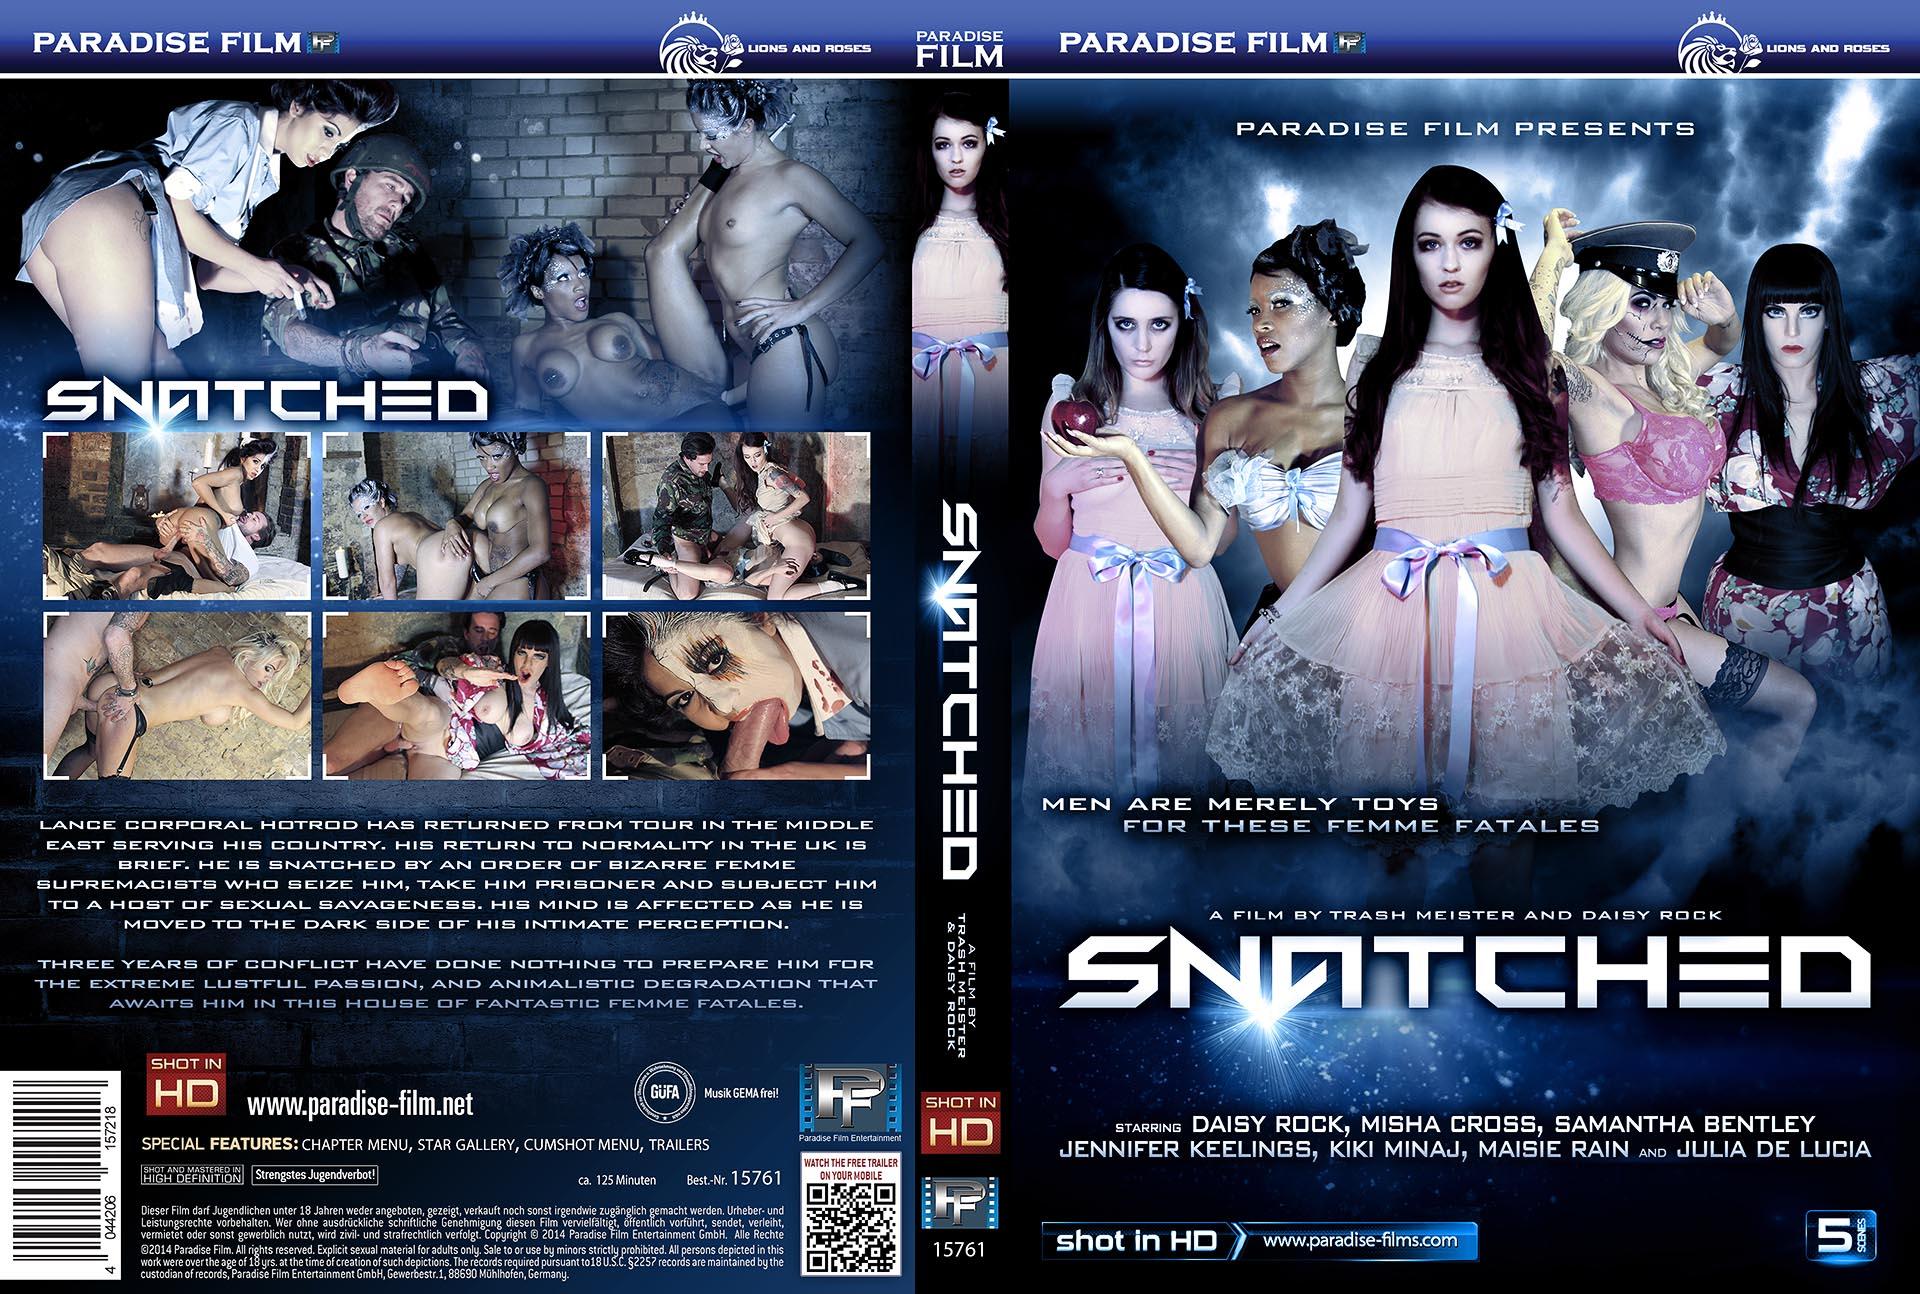 PF_Snatched_artwork_version3.jpg